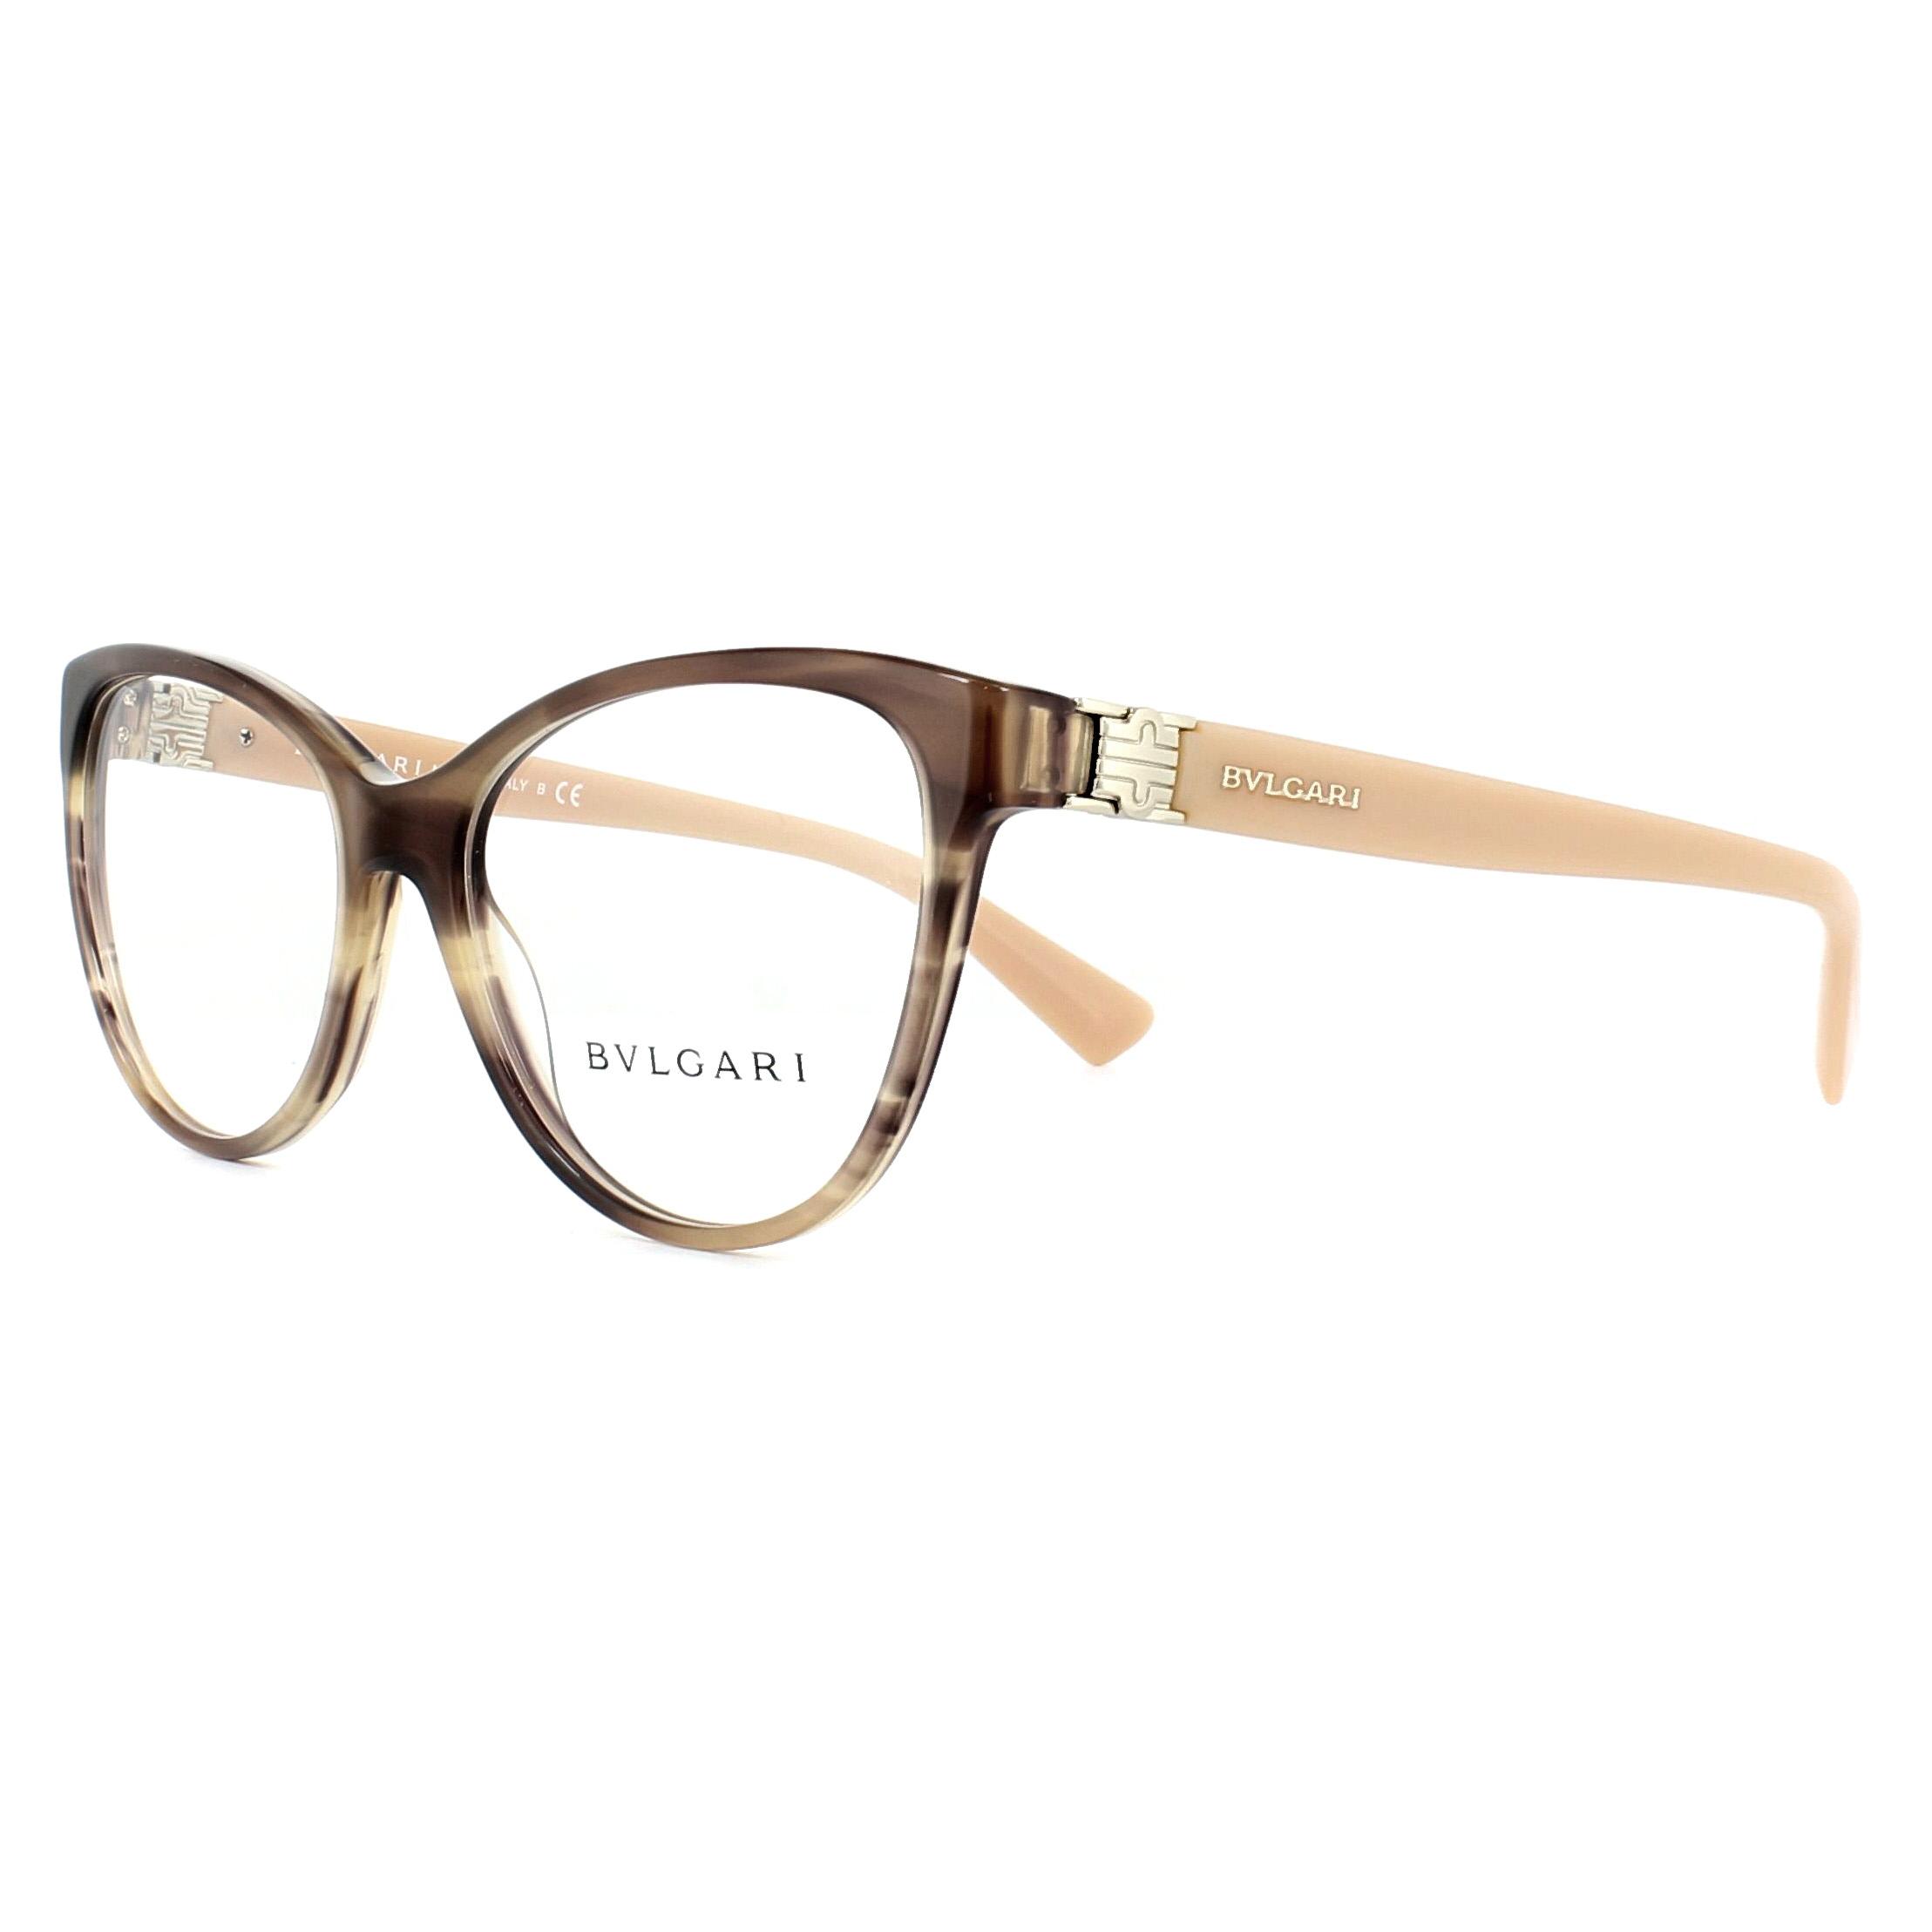 8a7ac87349f72 Sentinel Bvlgari Glasses Frames BV4151 5240 Striped Brown 54mm Womens